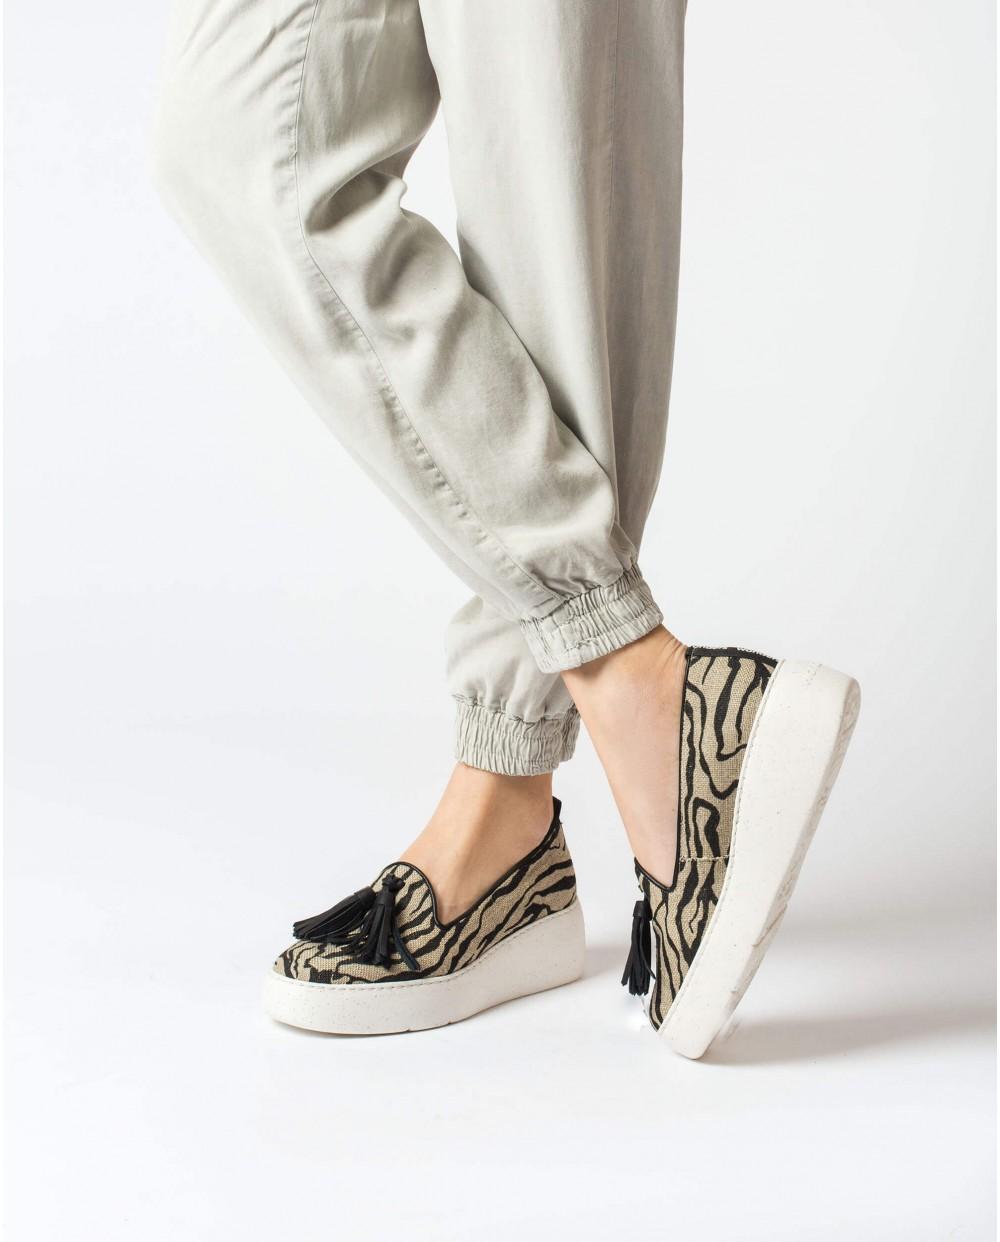 Wonders-Zapatos planos-Kenya